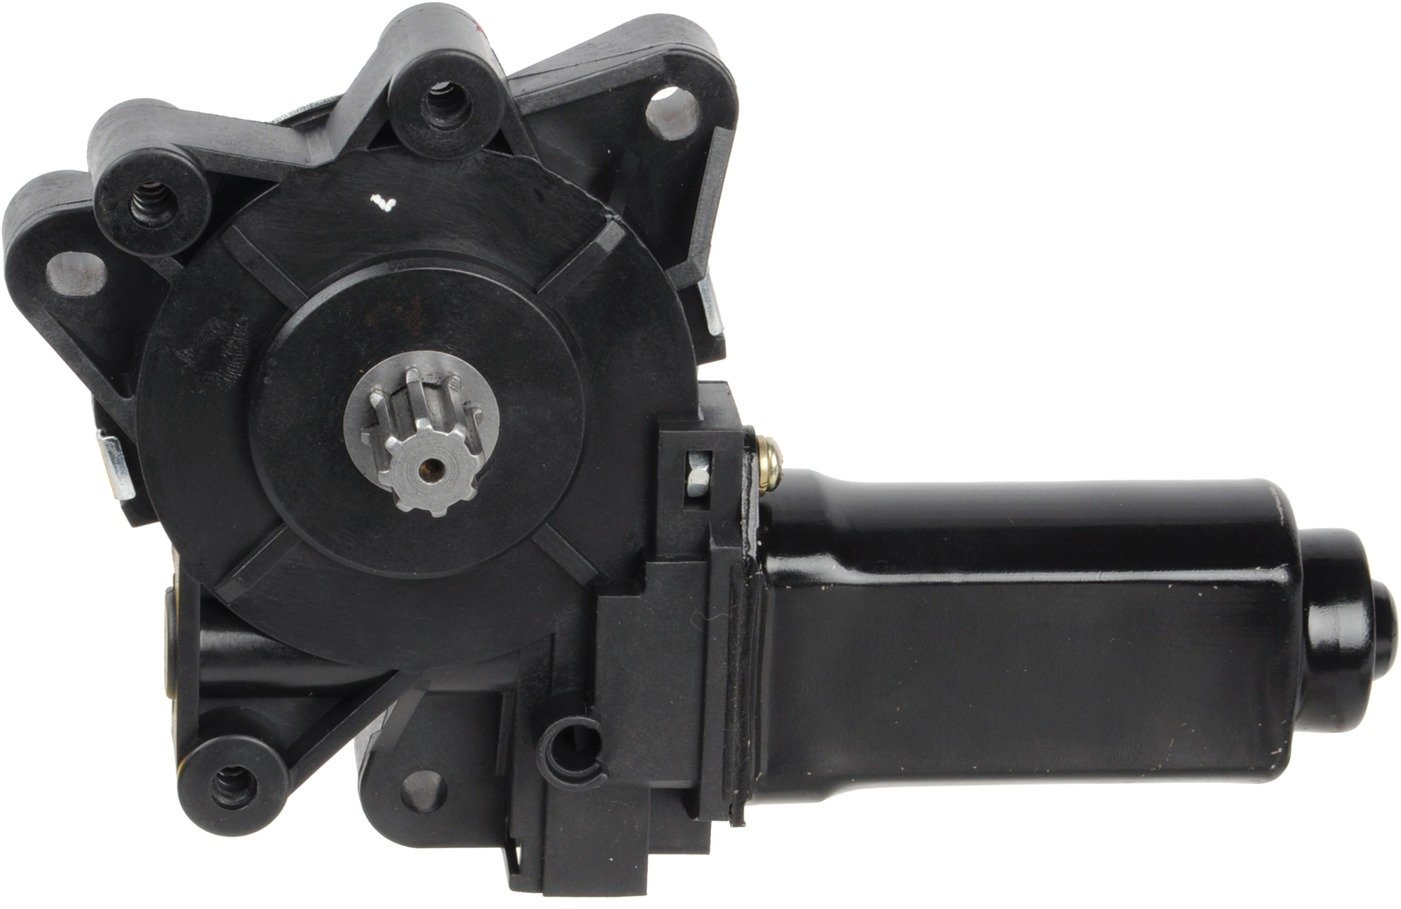 Cardone Select 82-454 New Window Lift Motor